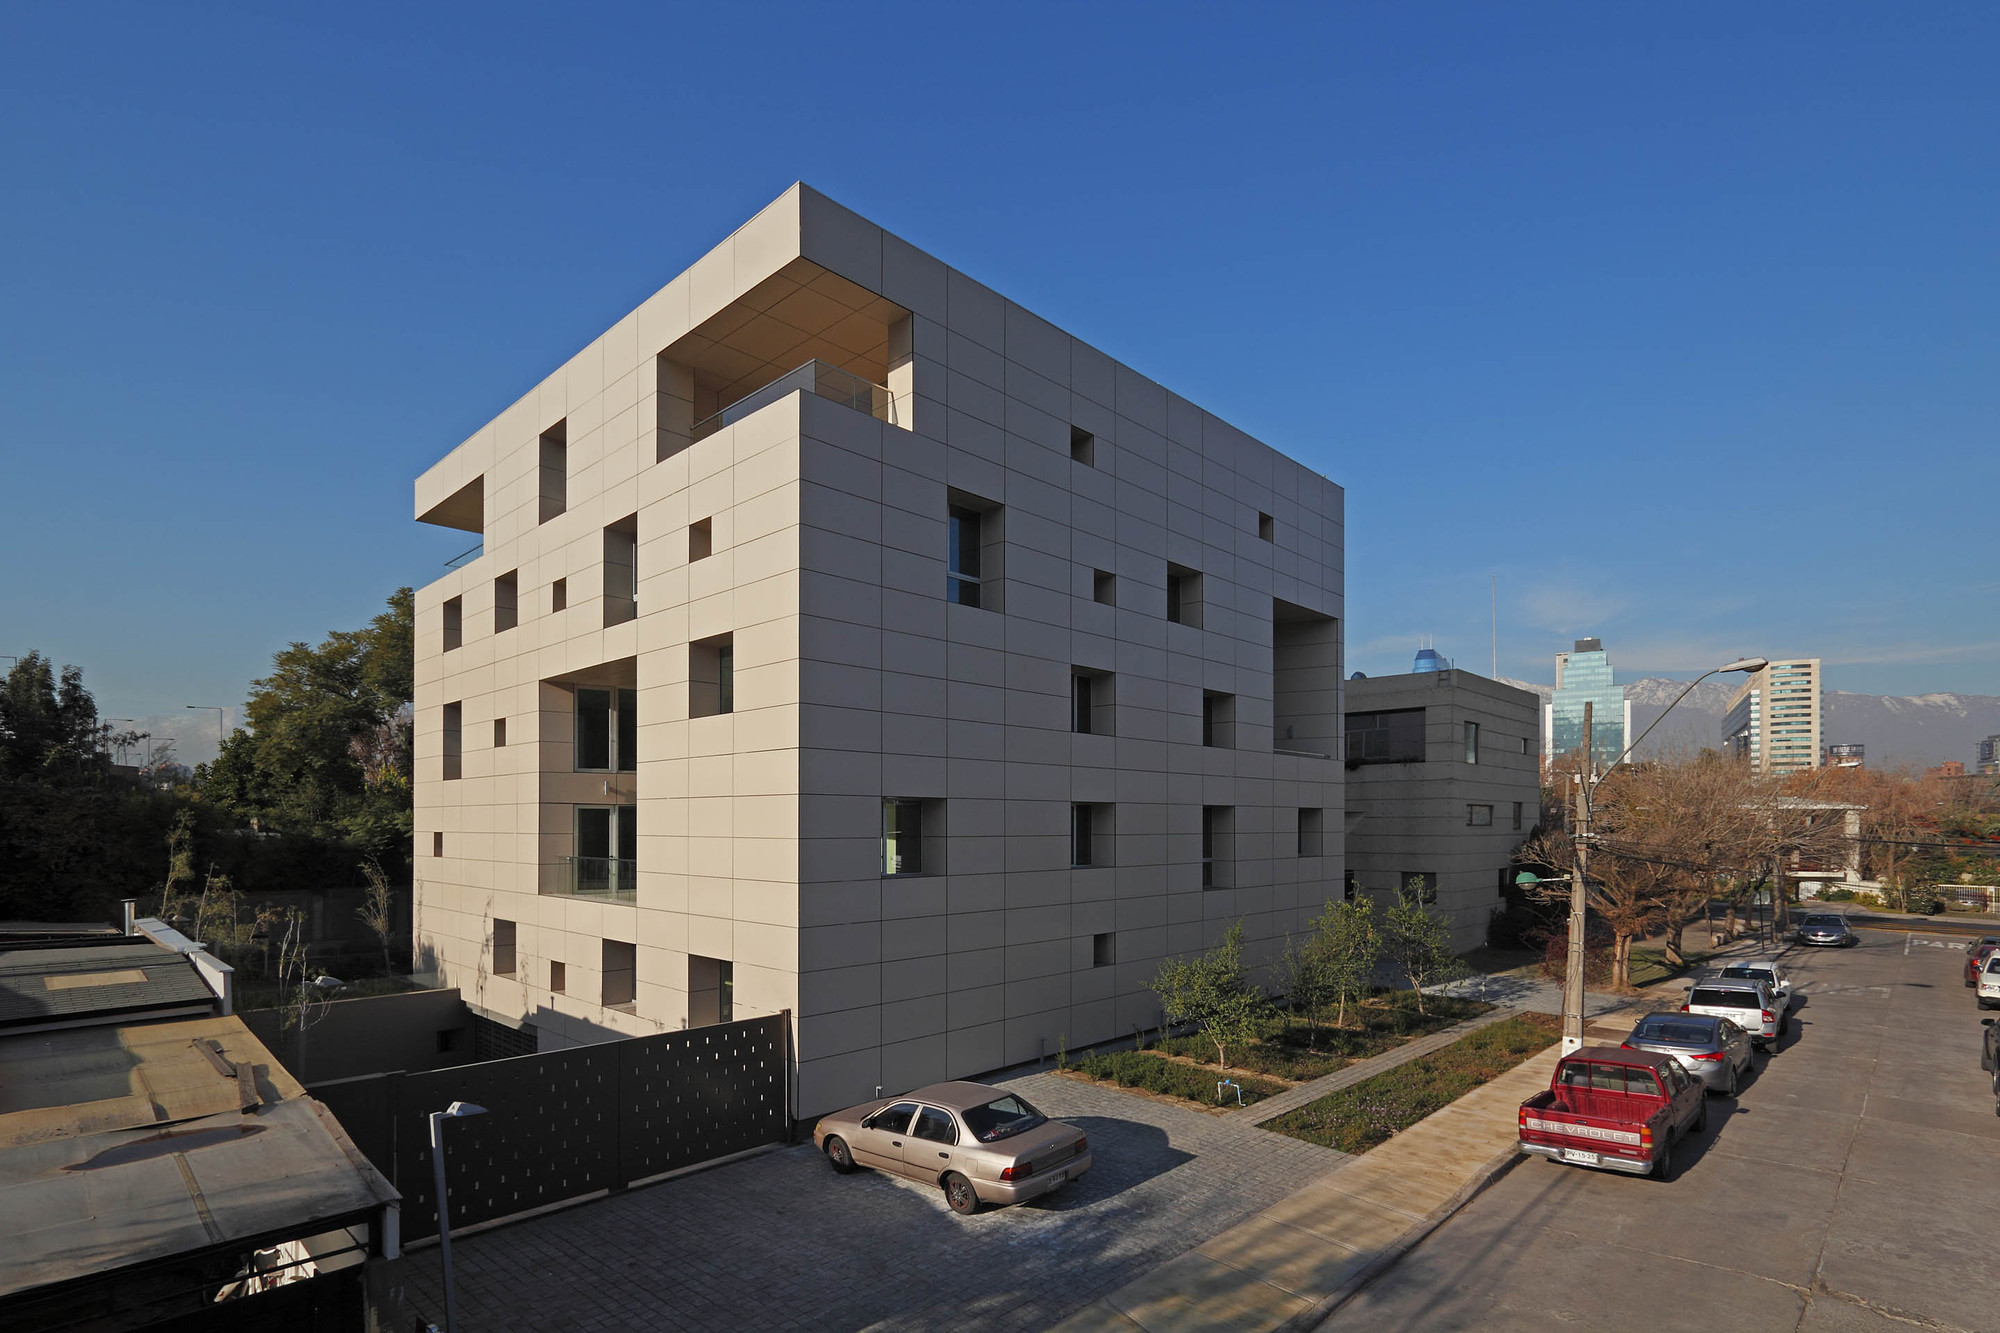 Resiter Office Building / Raimundo Lira Arquitectos, © Pedro Mutis